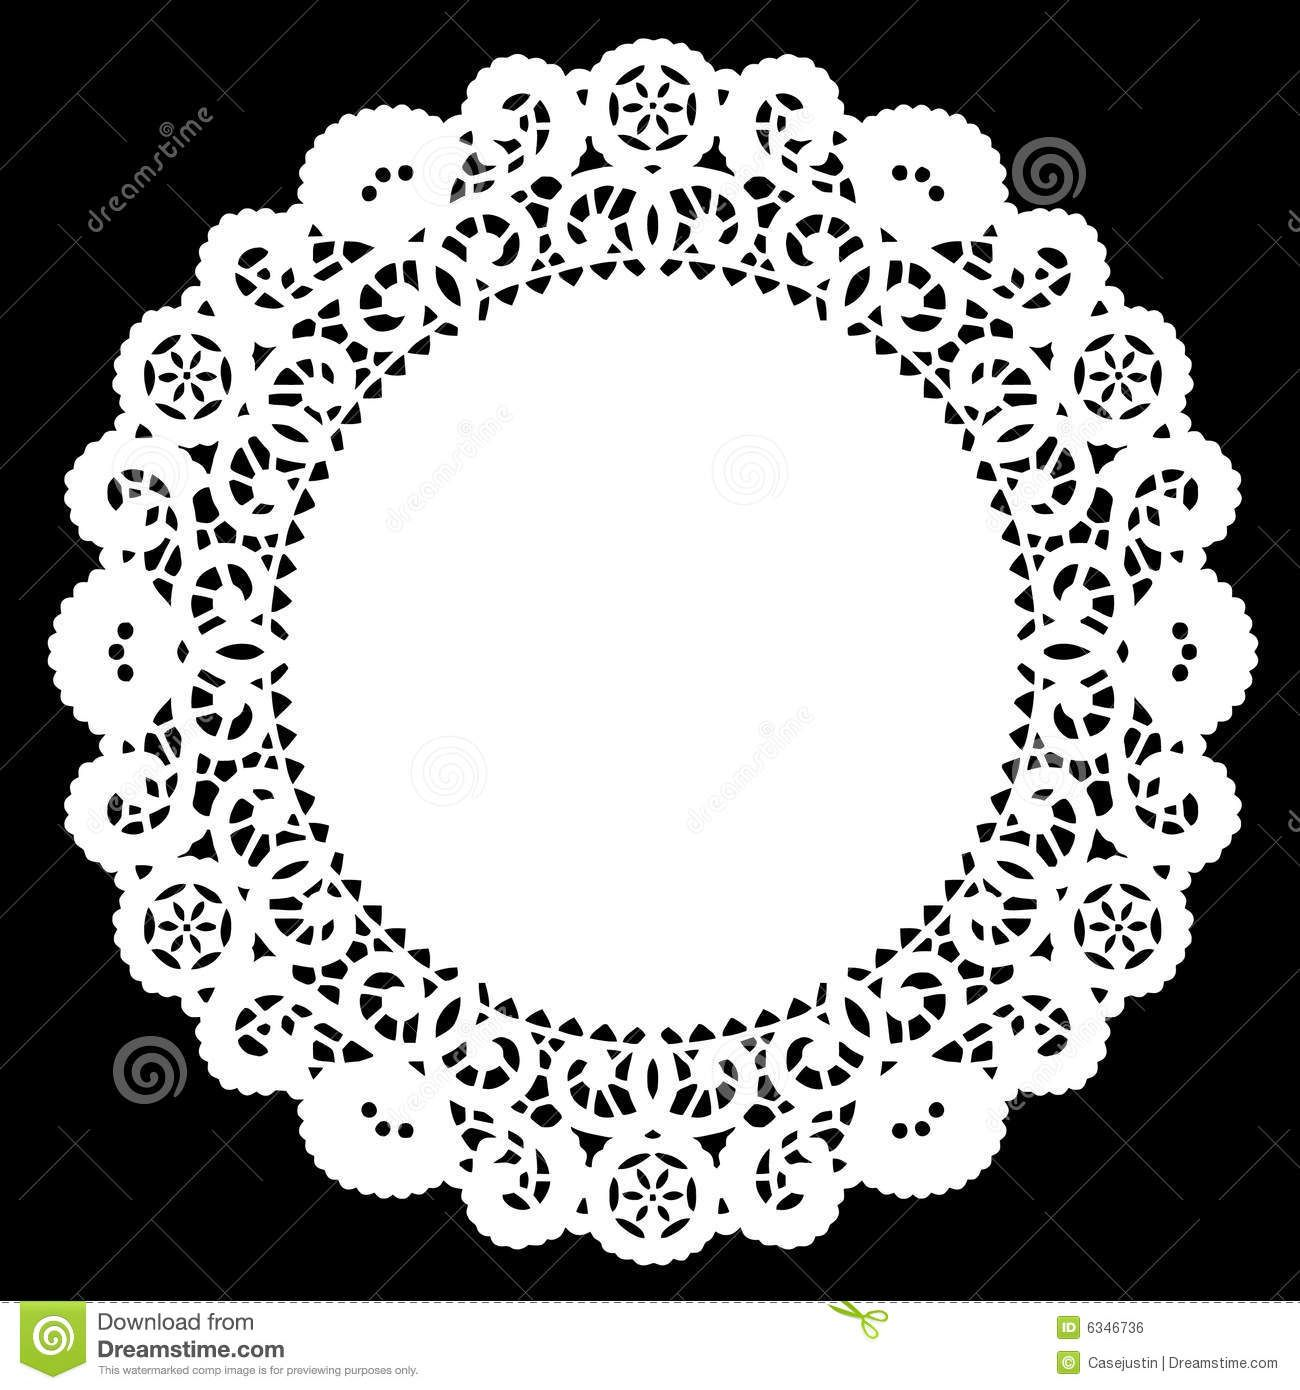 Cake Decorating Clip Art Black And White